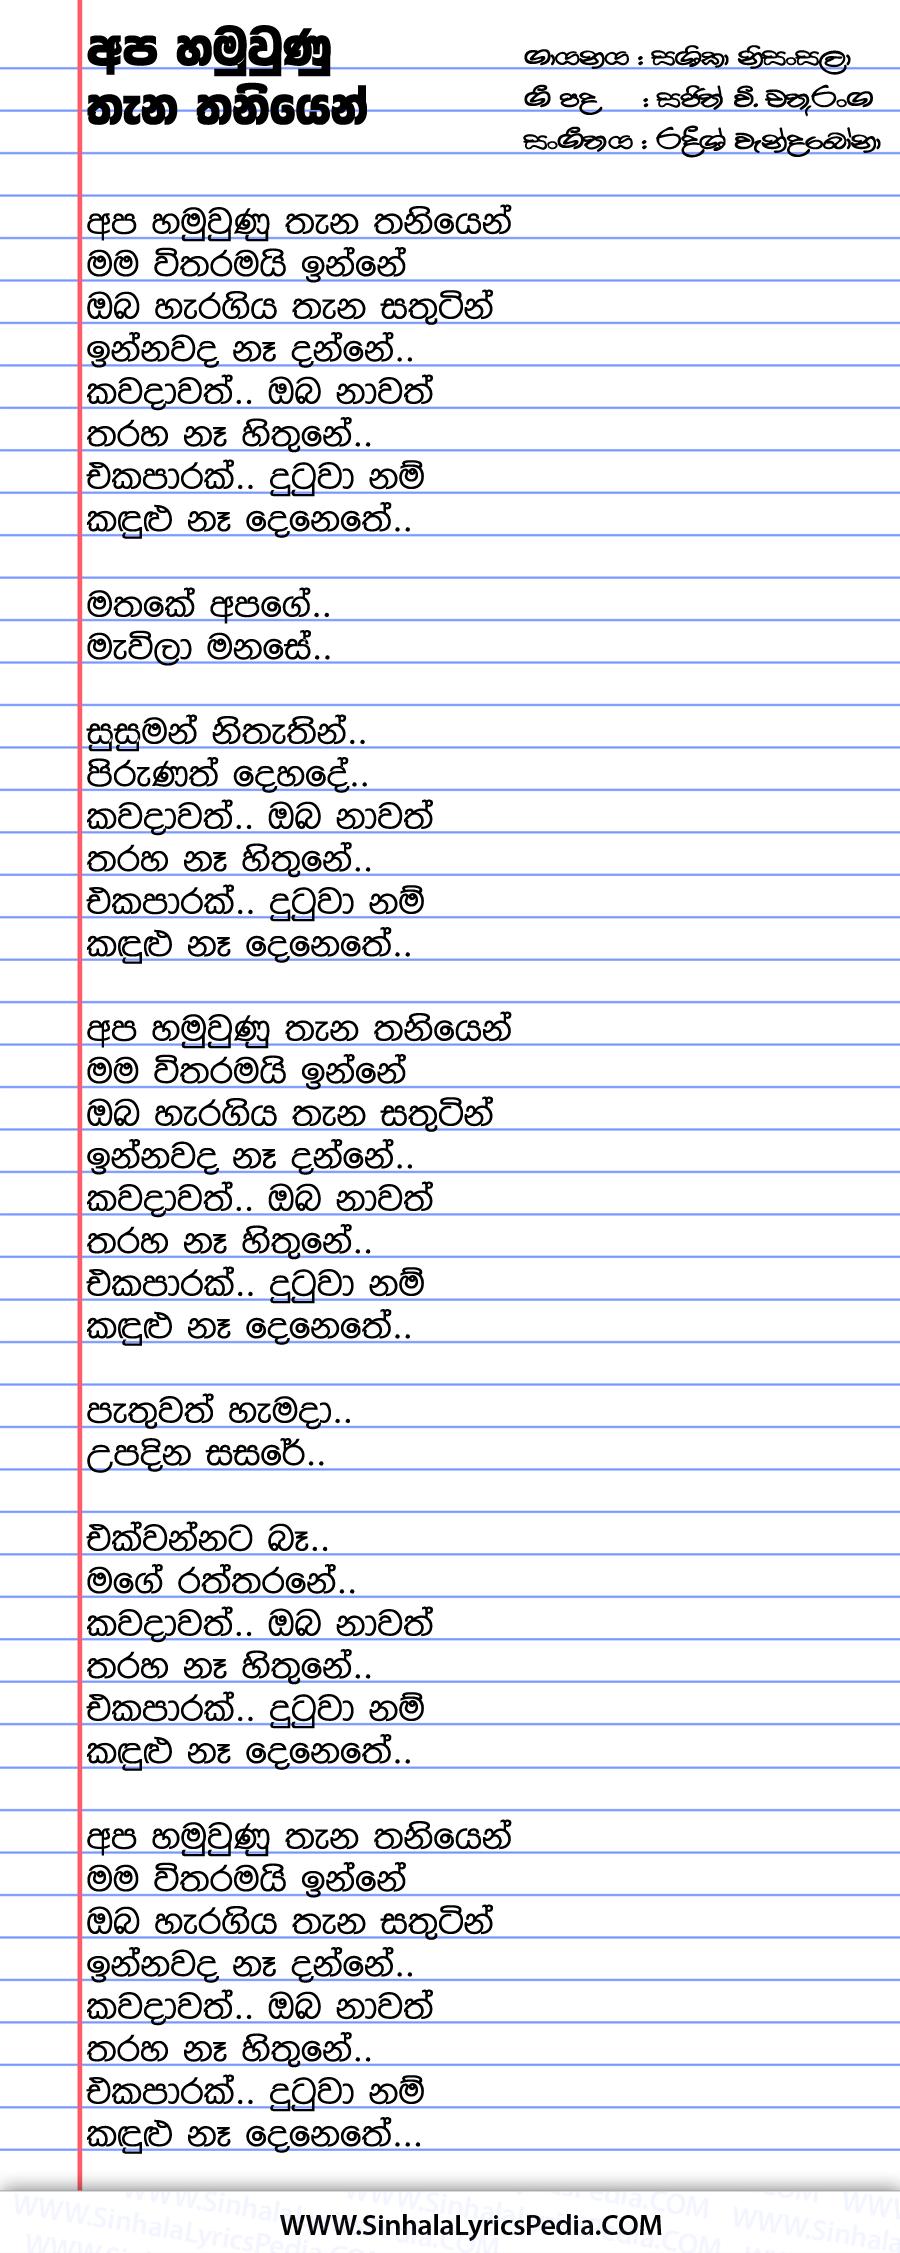 Apa Hamu Una Thana Thaniyen Song Lyrics